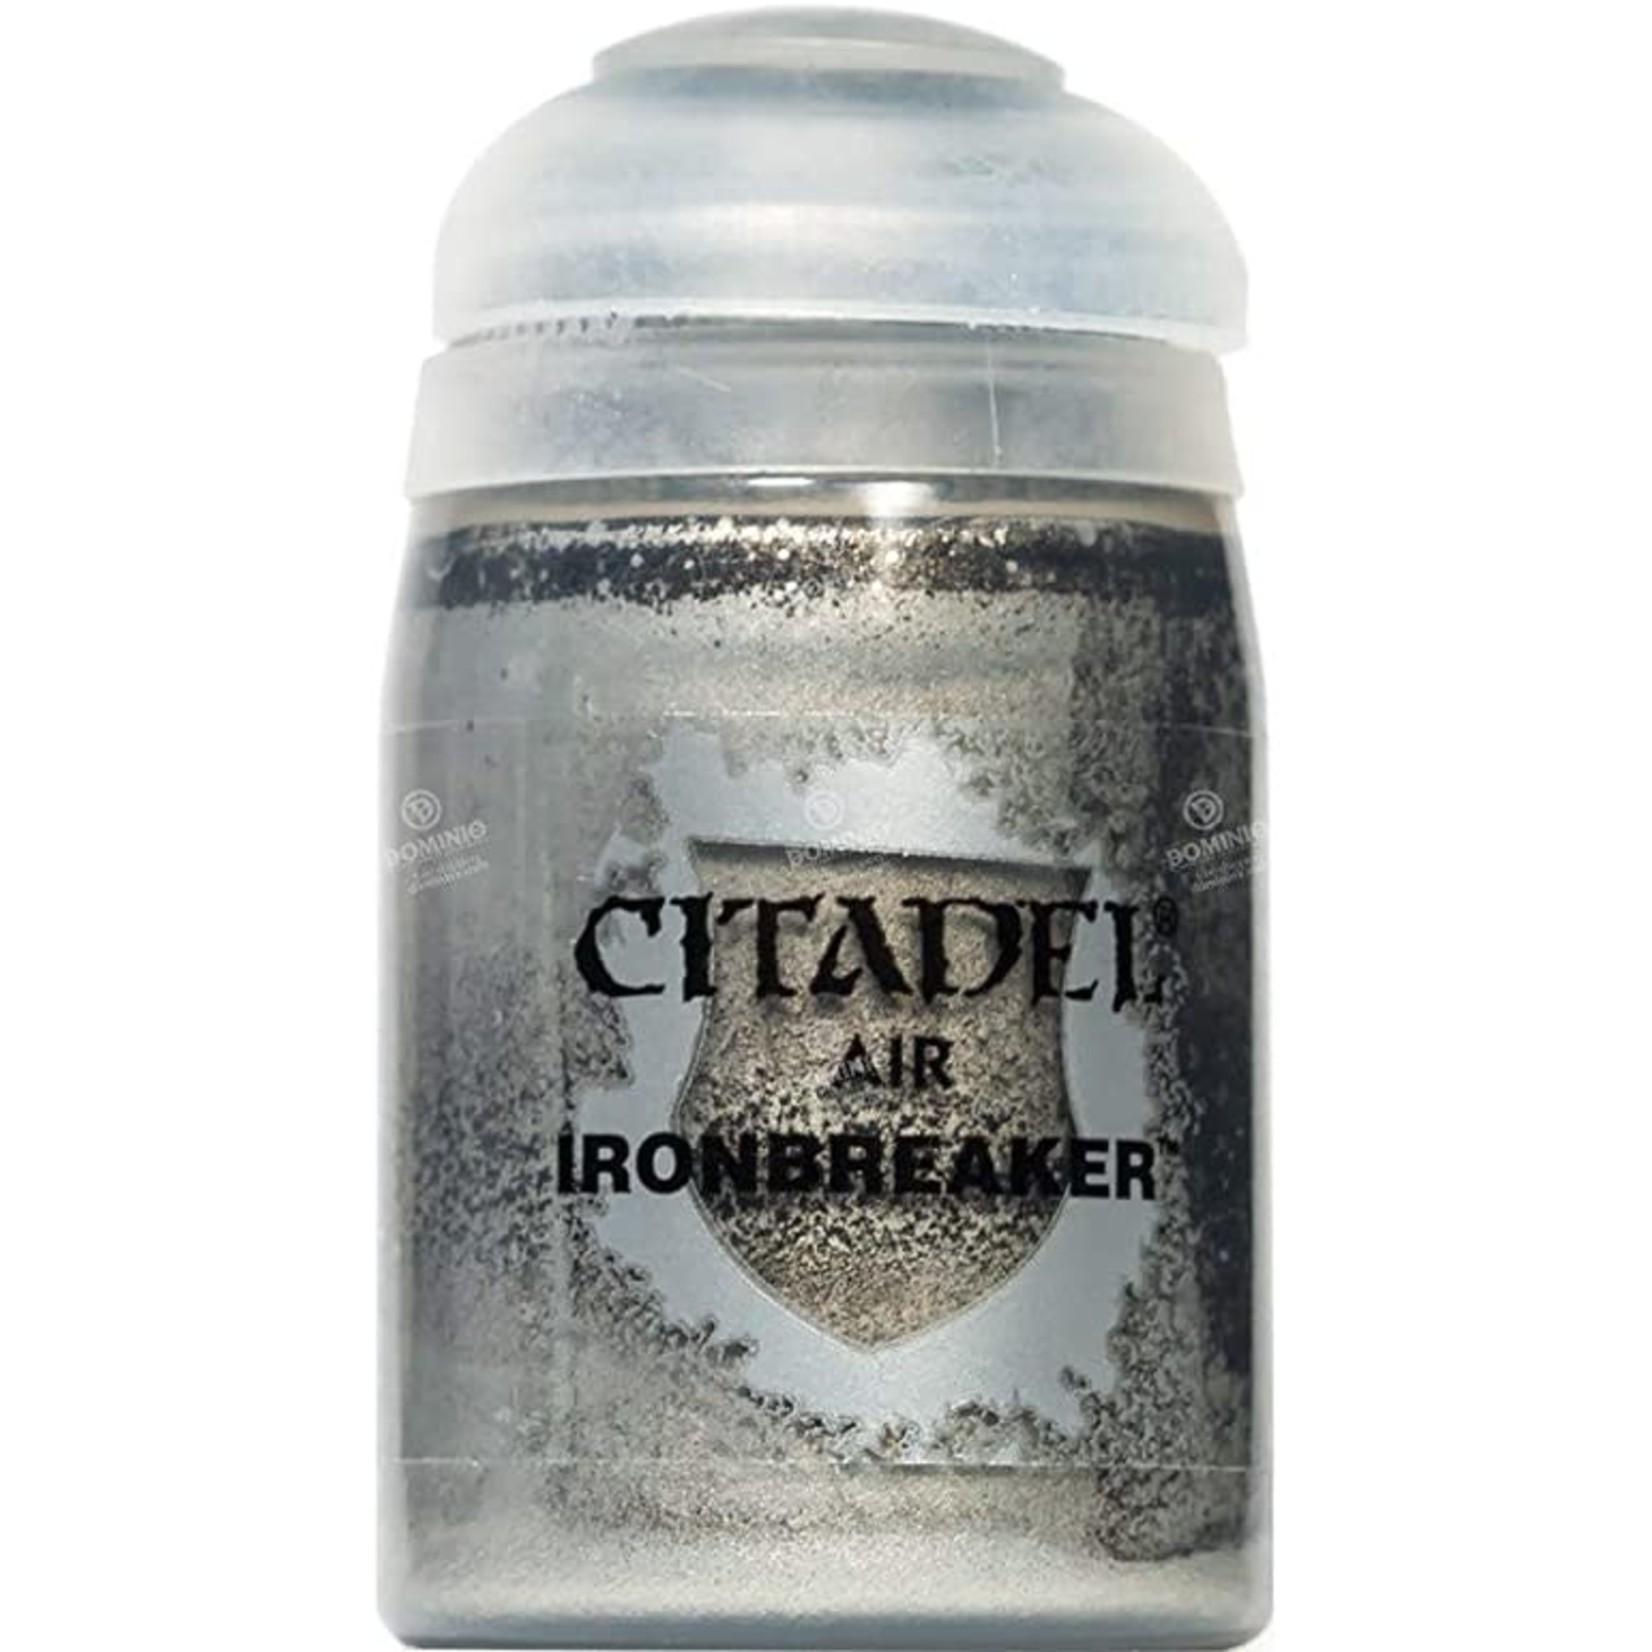 Games Workshop Citadel Paint: Ironbreaker Air (24 ml)